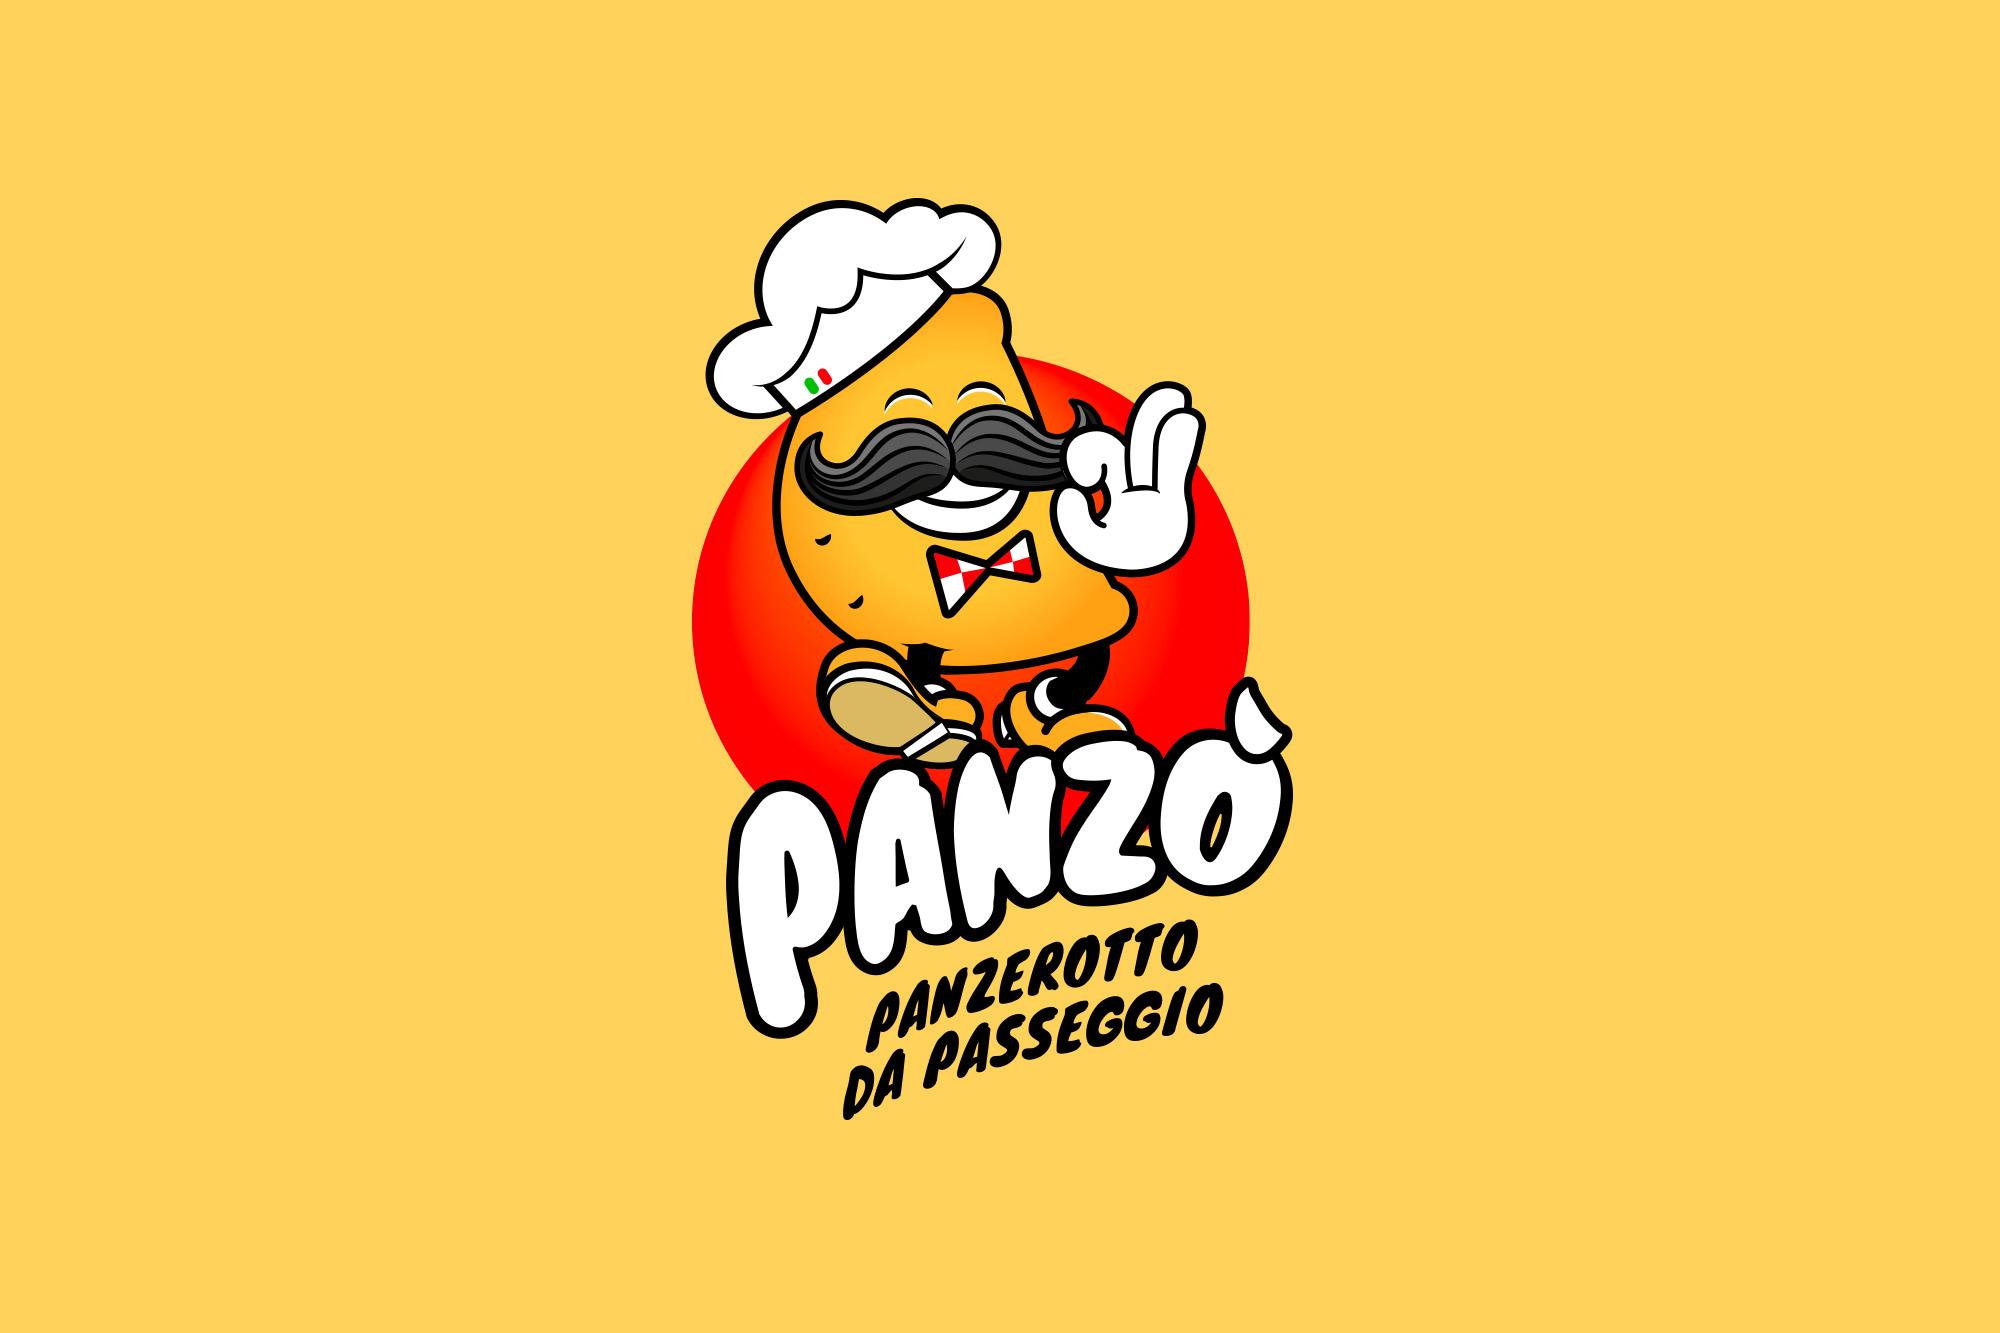 Panzò - Panzerotto da passeggio - logo, branding - img 1